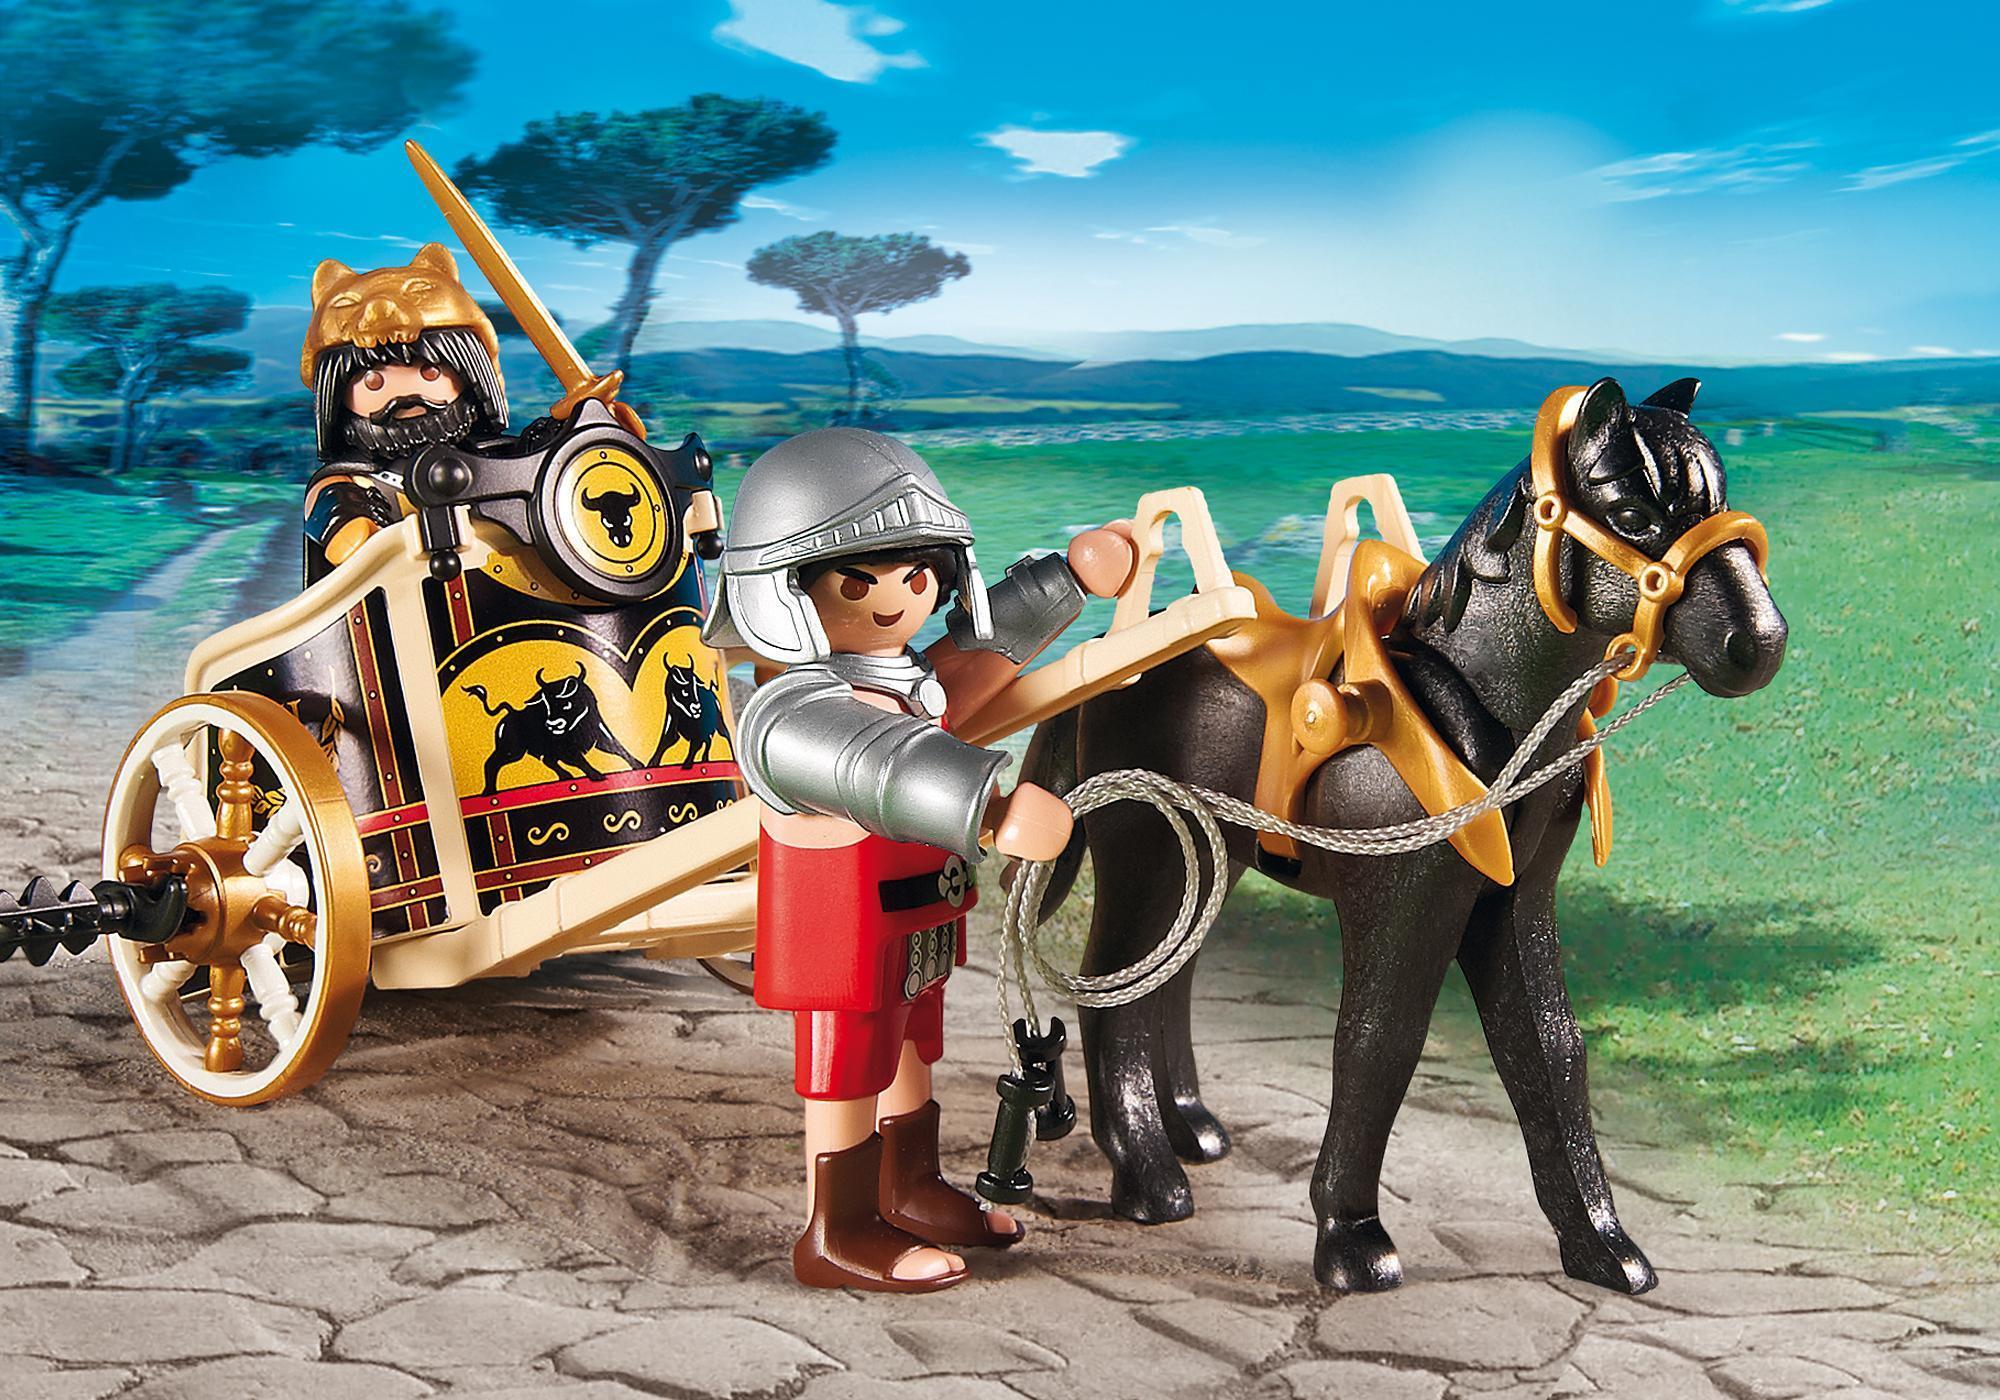 http://media.playmobil.com/i/playmobil/6868_product_extra1